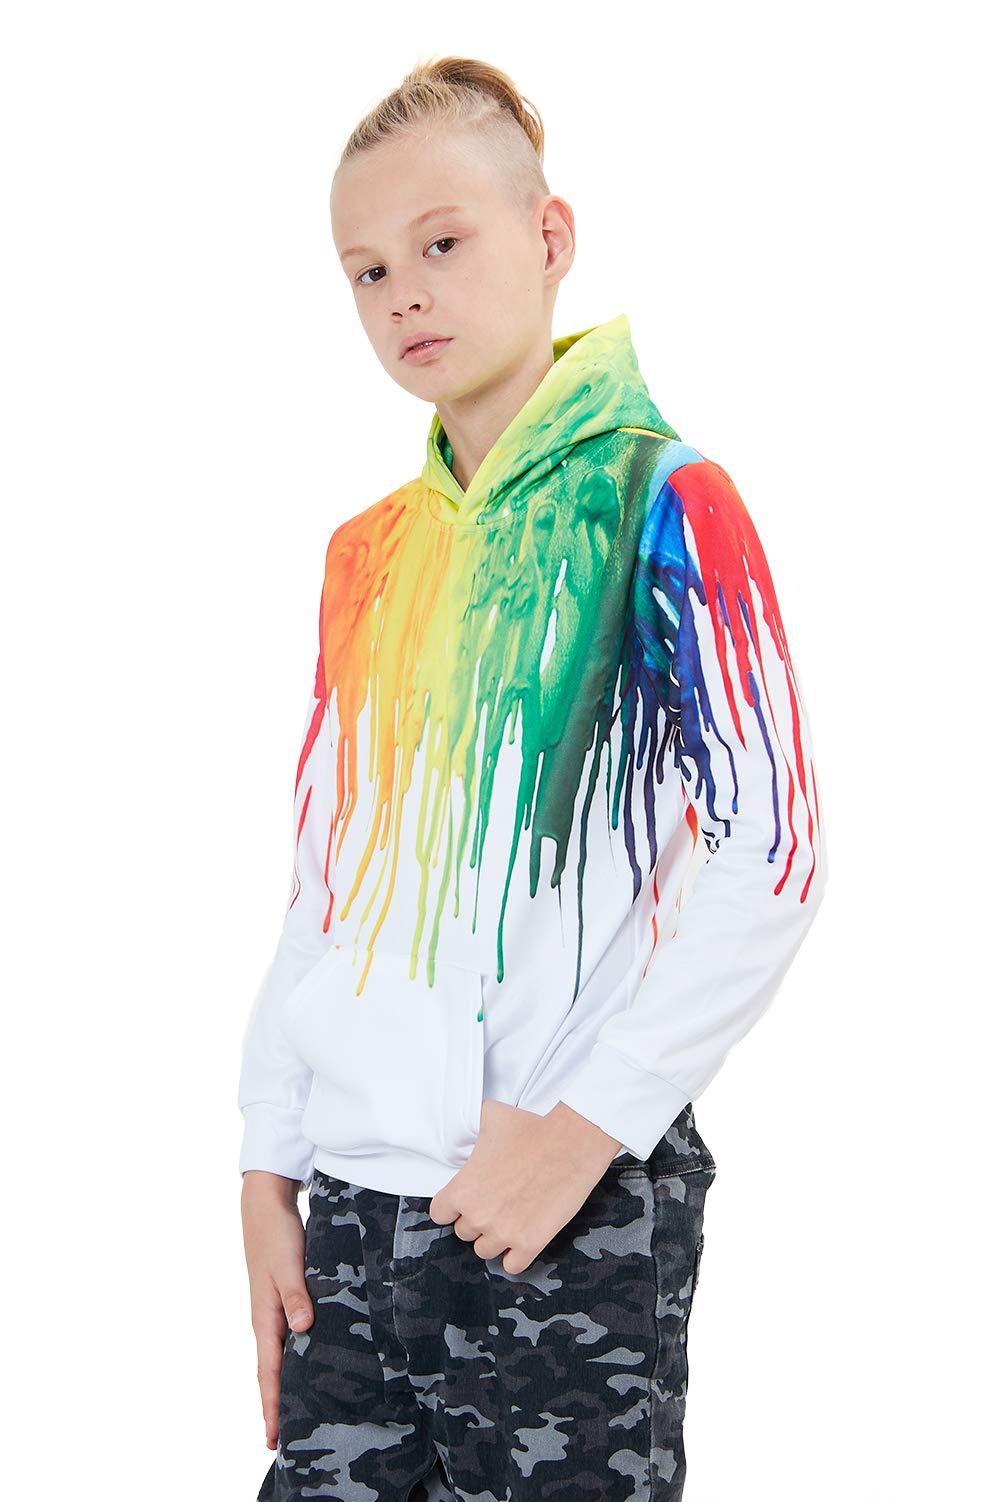 Unisex Teens Girls Boys Hoodies Hip Pop Hoody 3D Splash Rainbow Ink Novelty Pullover Long Sleeve Front Pocket Sweatshirt for Party Sports School Medium 5-6 Years